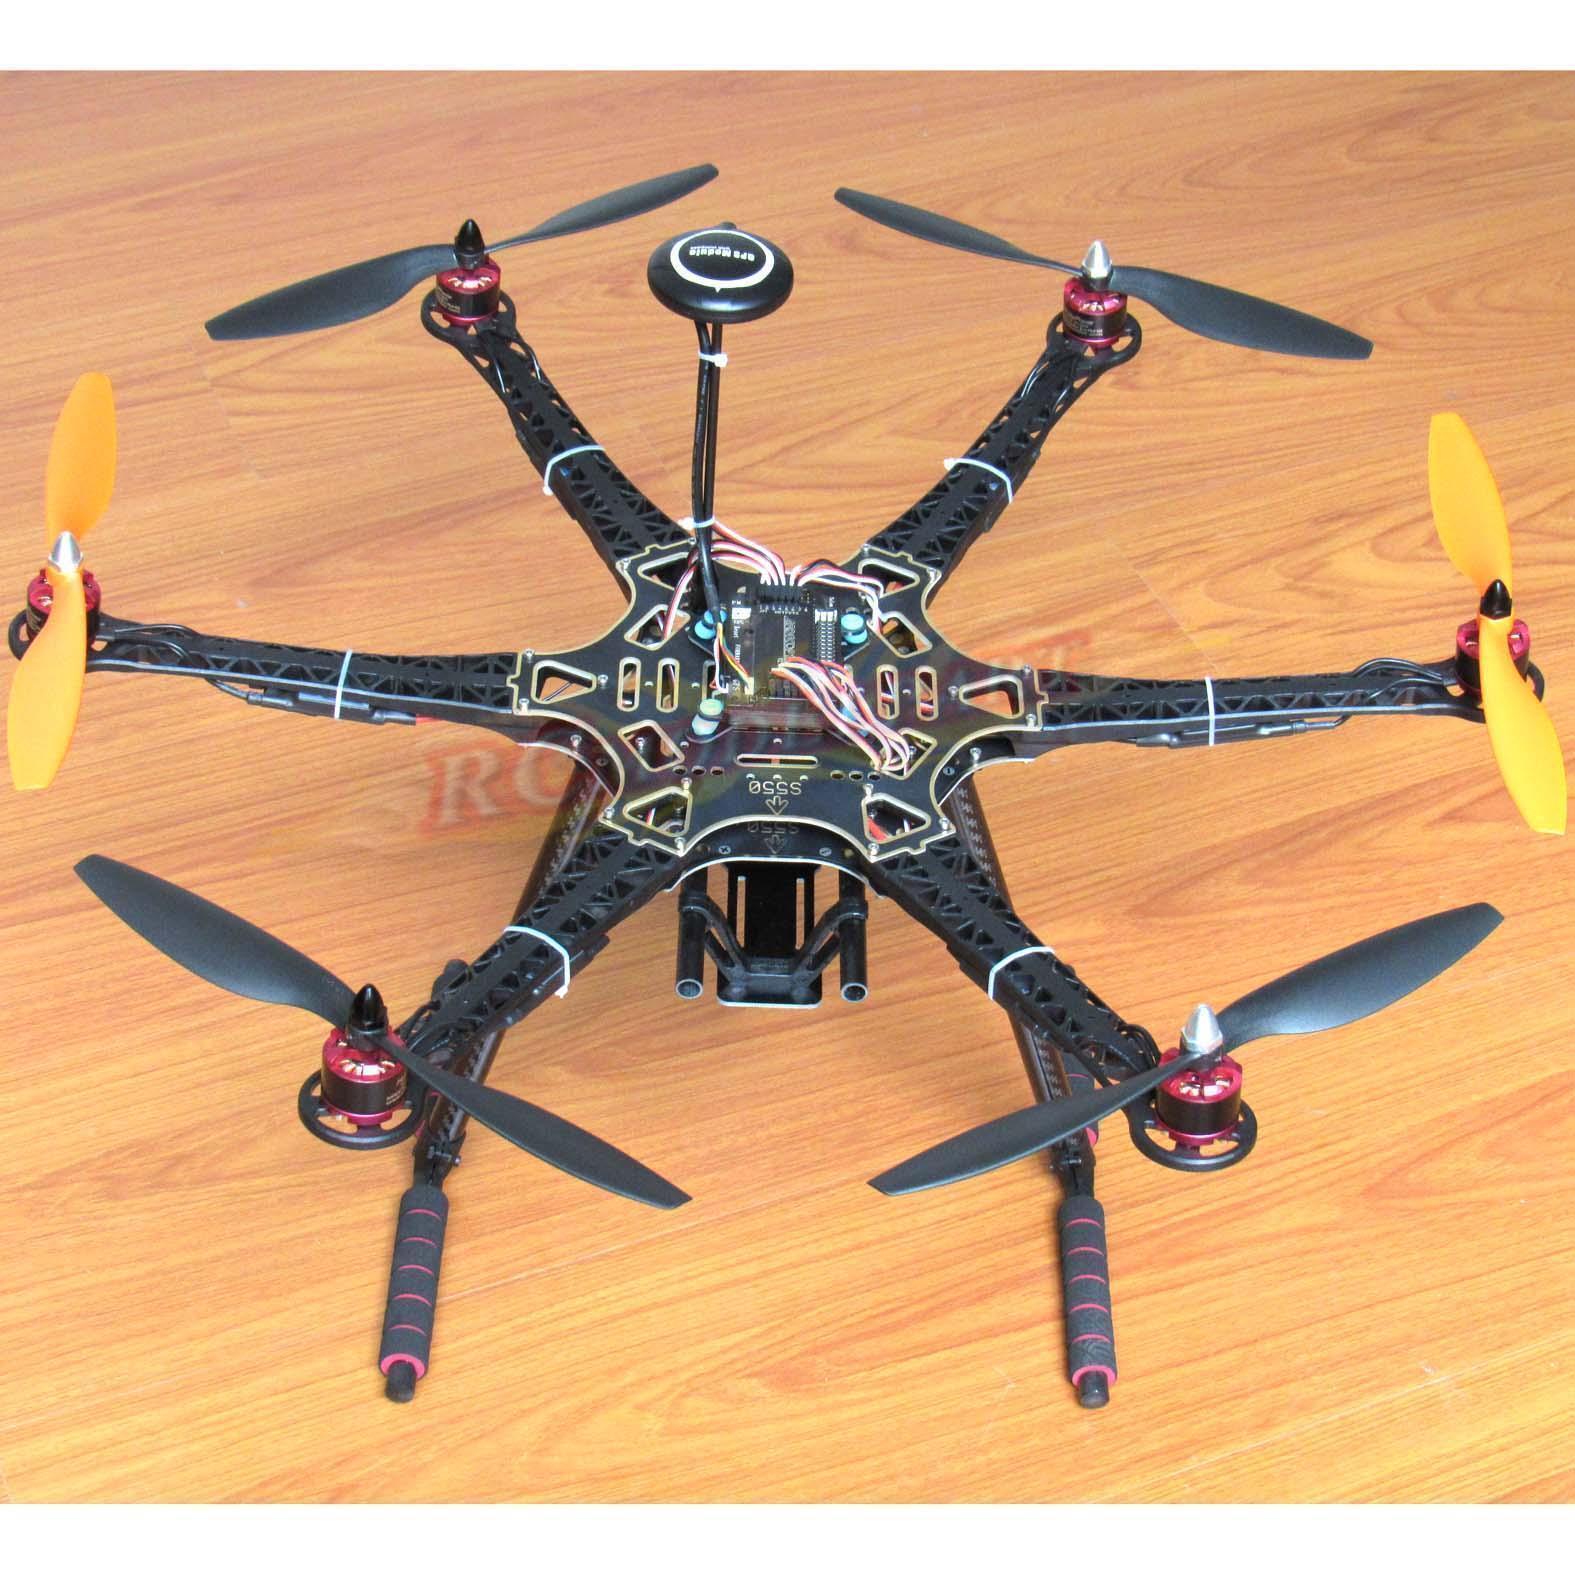 Diy - s550 hexacopter apm2.8 fc neo-7m gps hp2212 920kv bl - simonk 30a esc